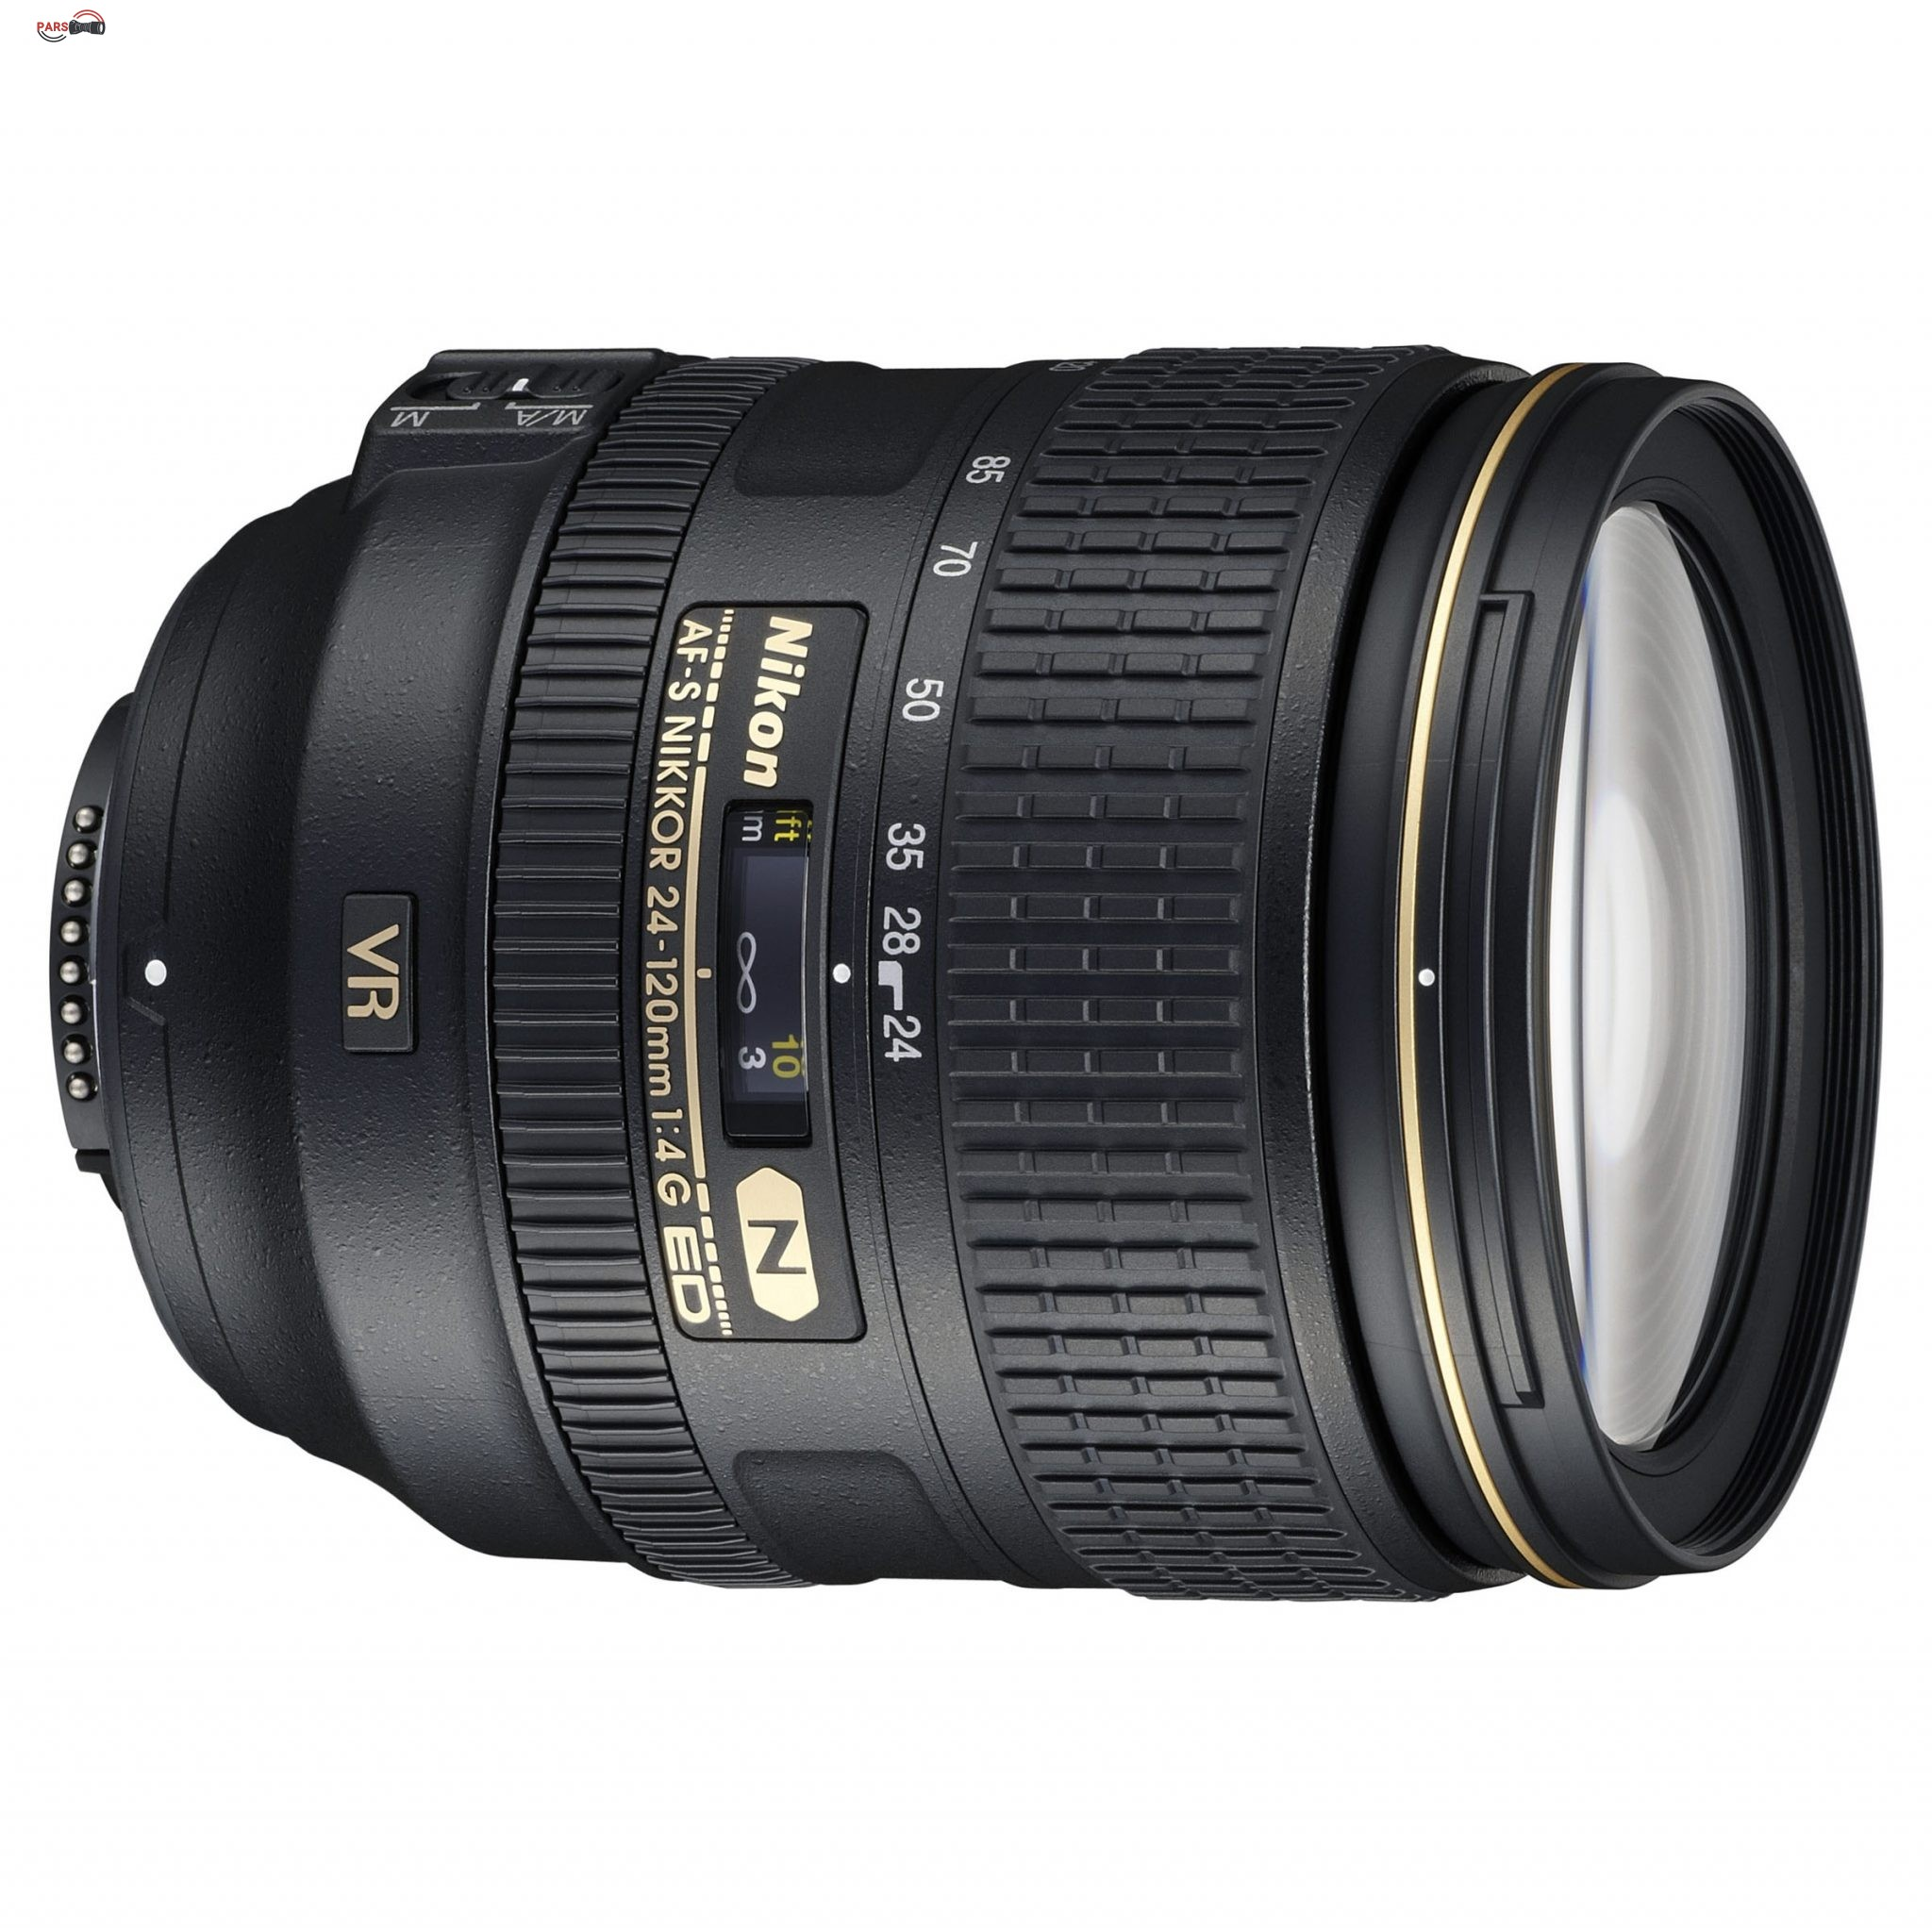 لنز دوربین نیکون AF-S 24-120mm F/4G ED VR